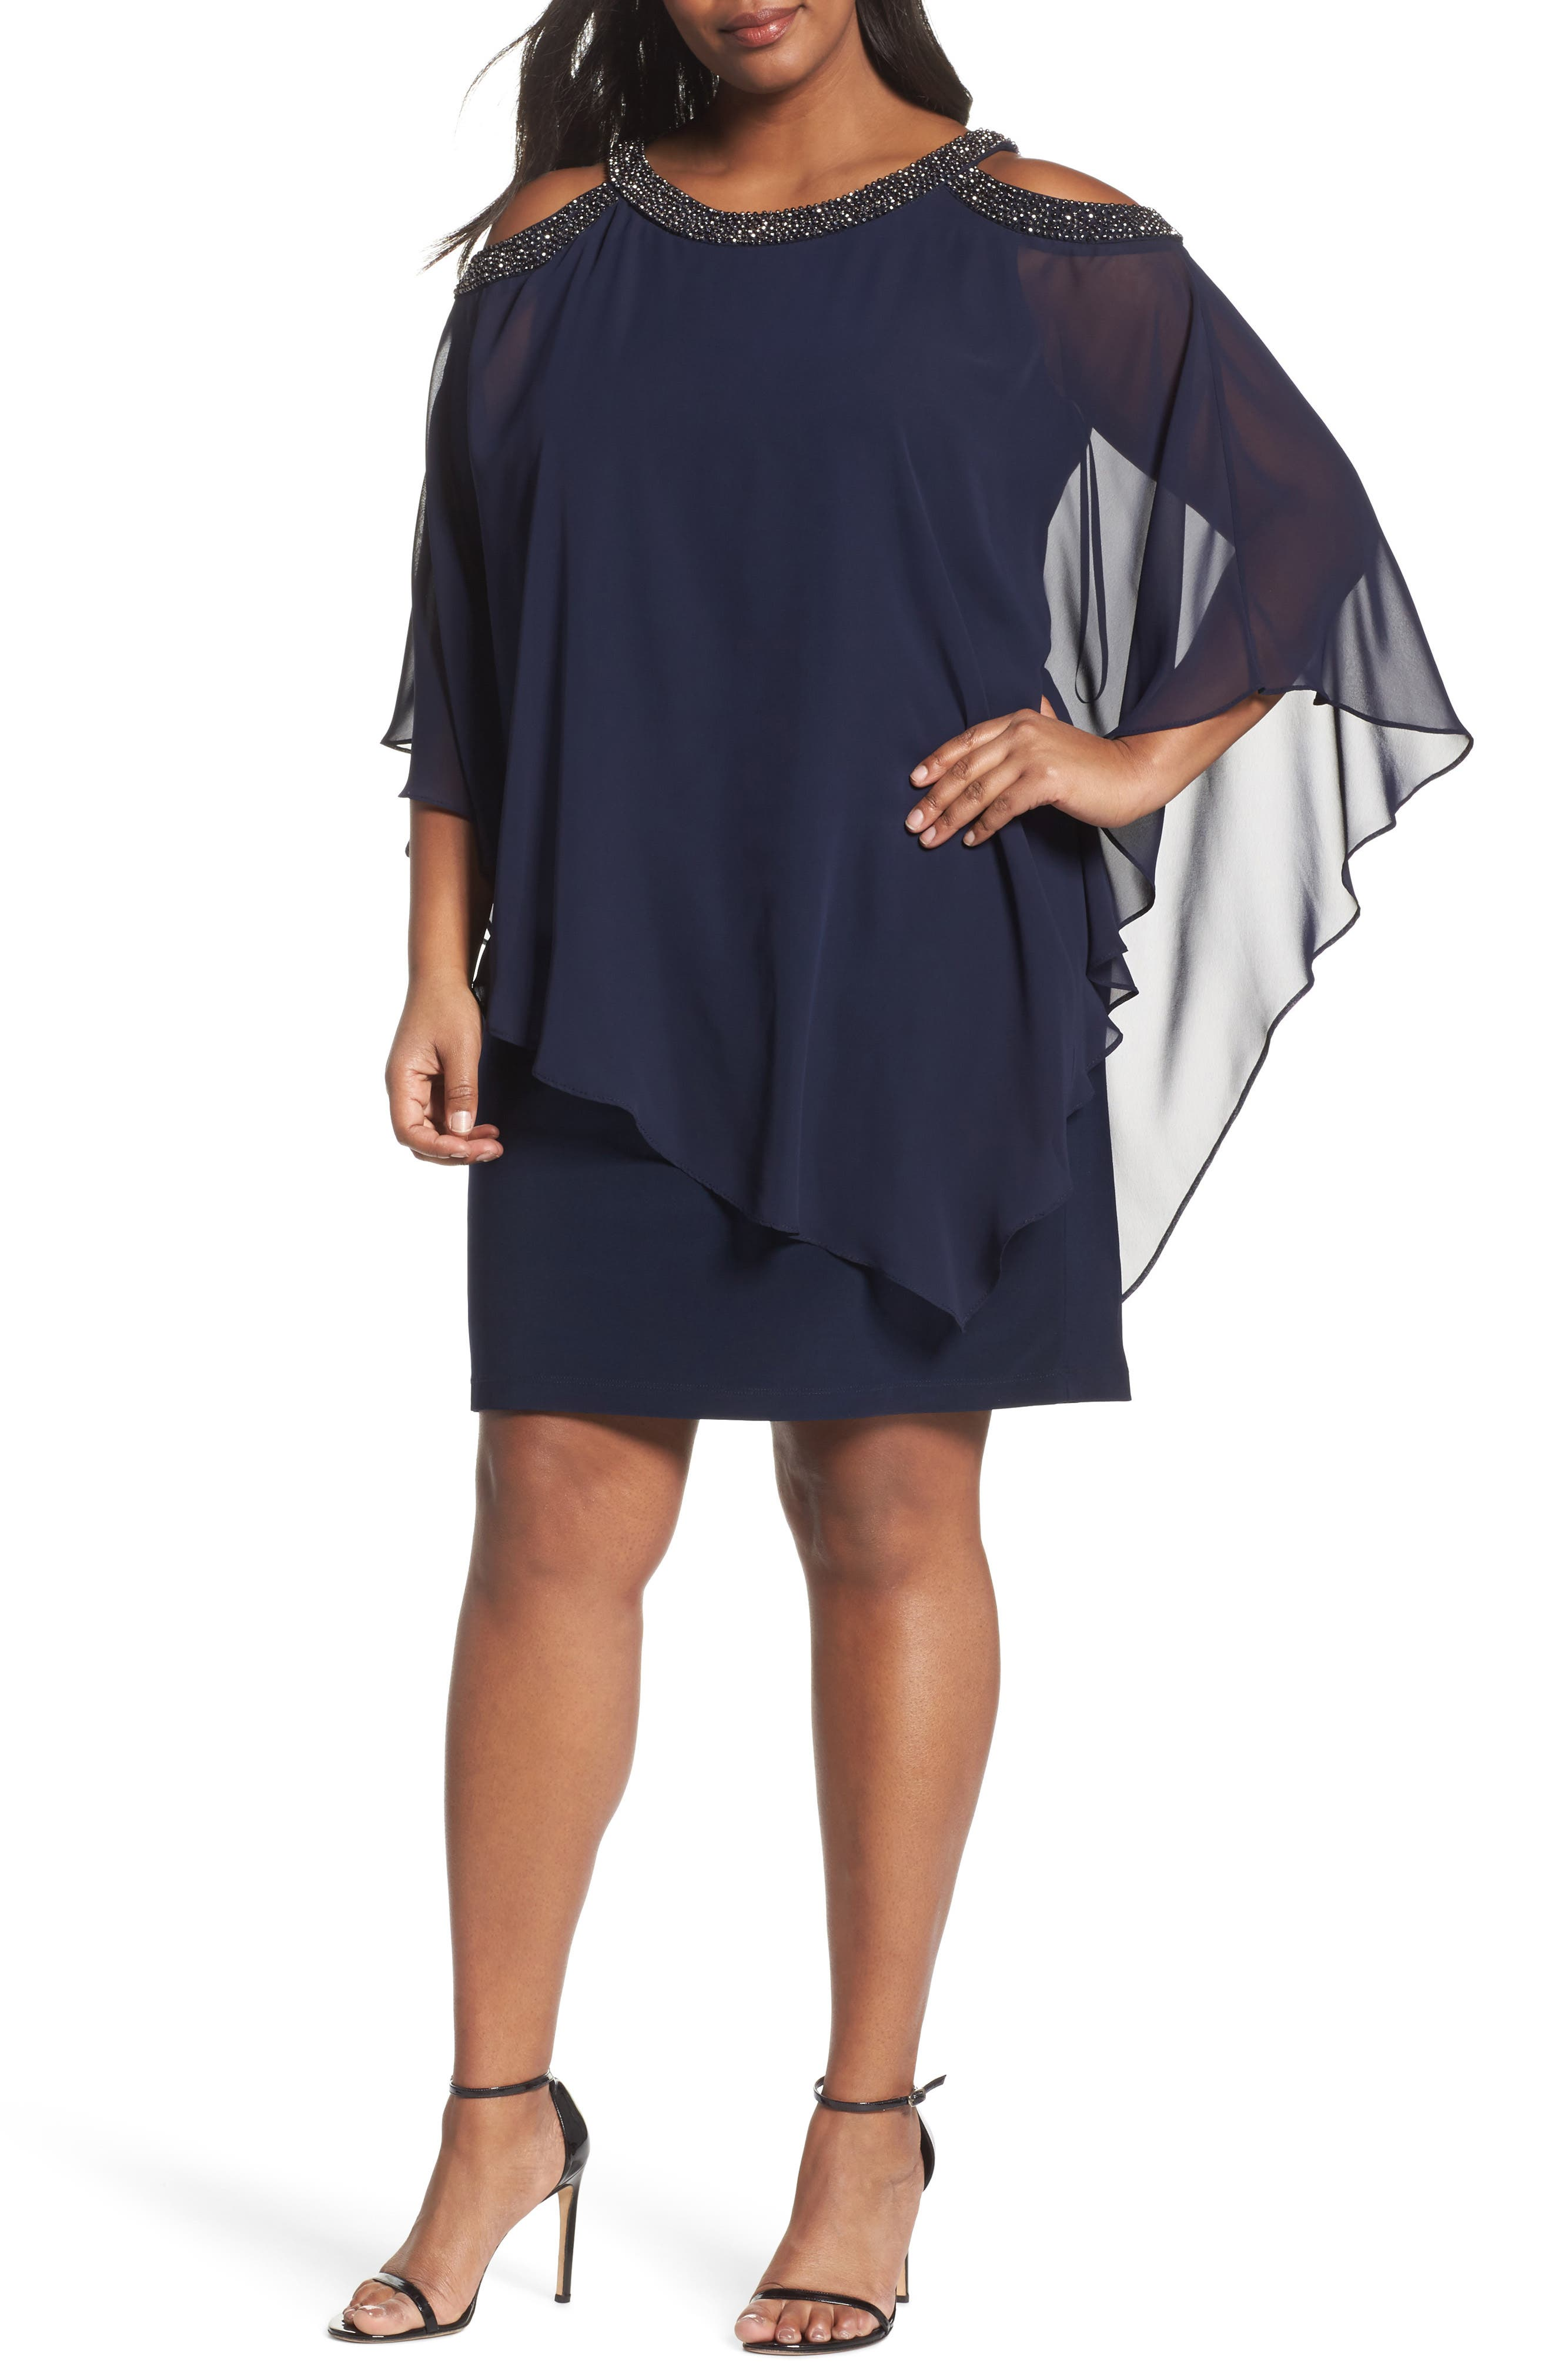 Chiffon Overlay Dress,                             Main thumbnail 1, color,                             Navy/ Gunmetal